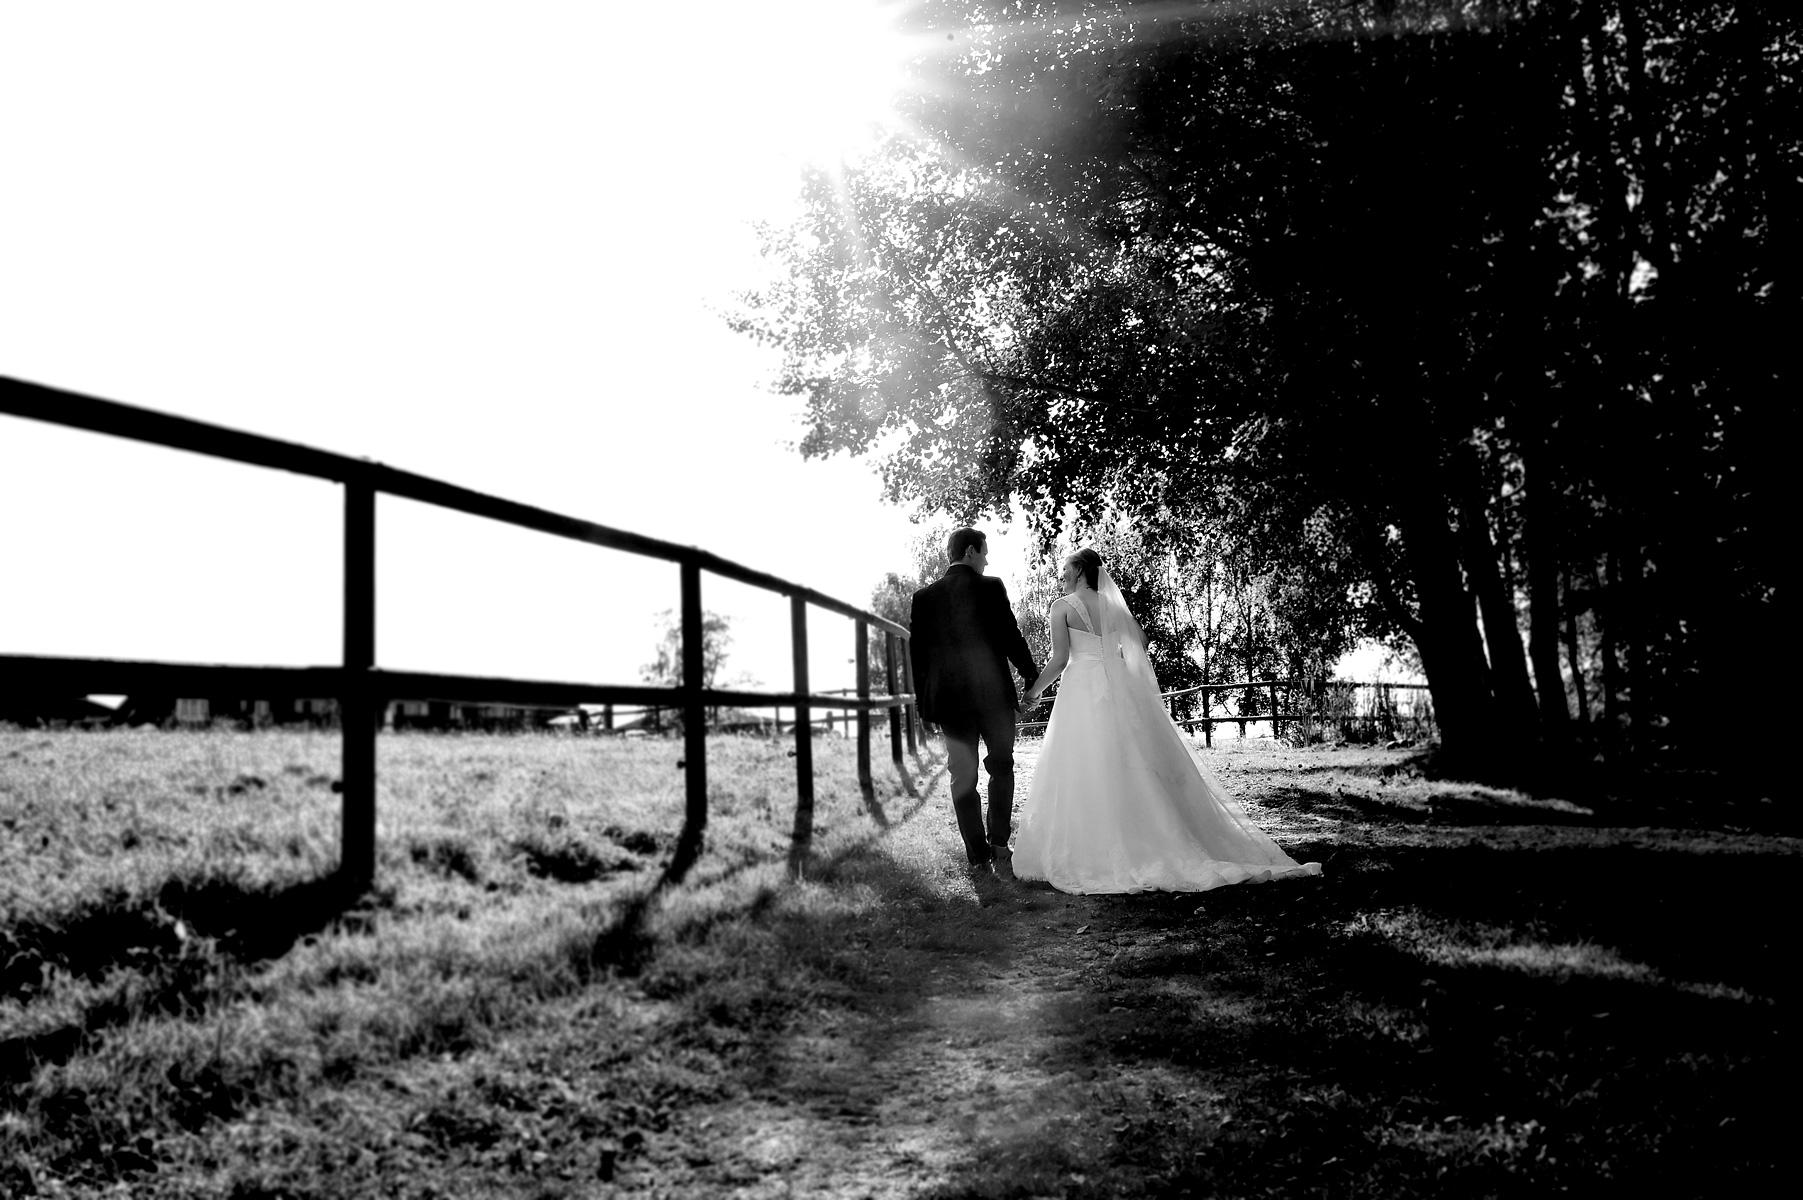 Brautpaar_Nicole-Bouillon-Fotografie27.jpg